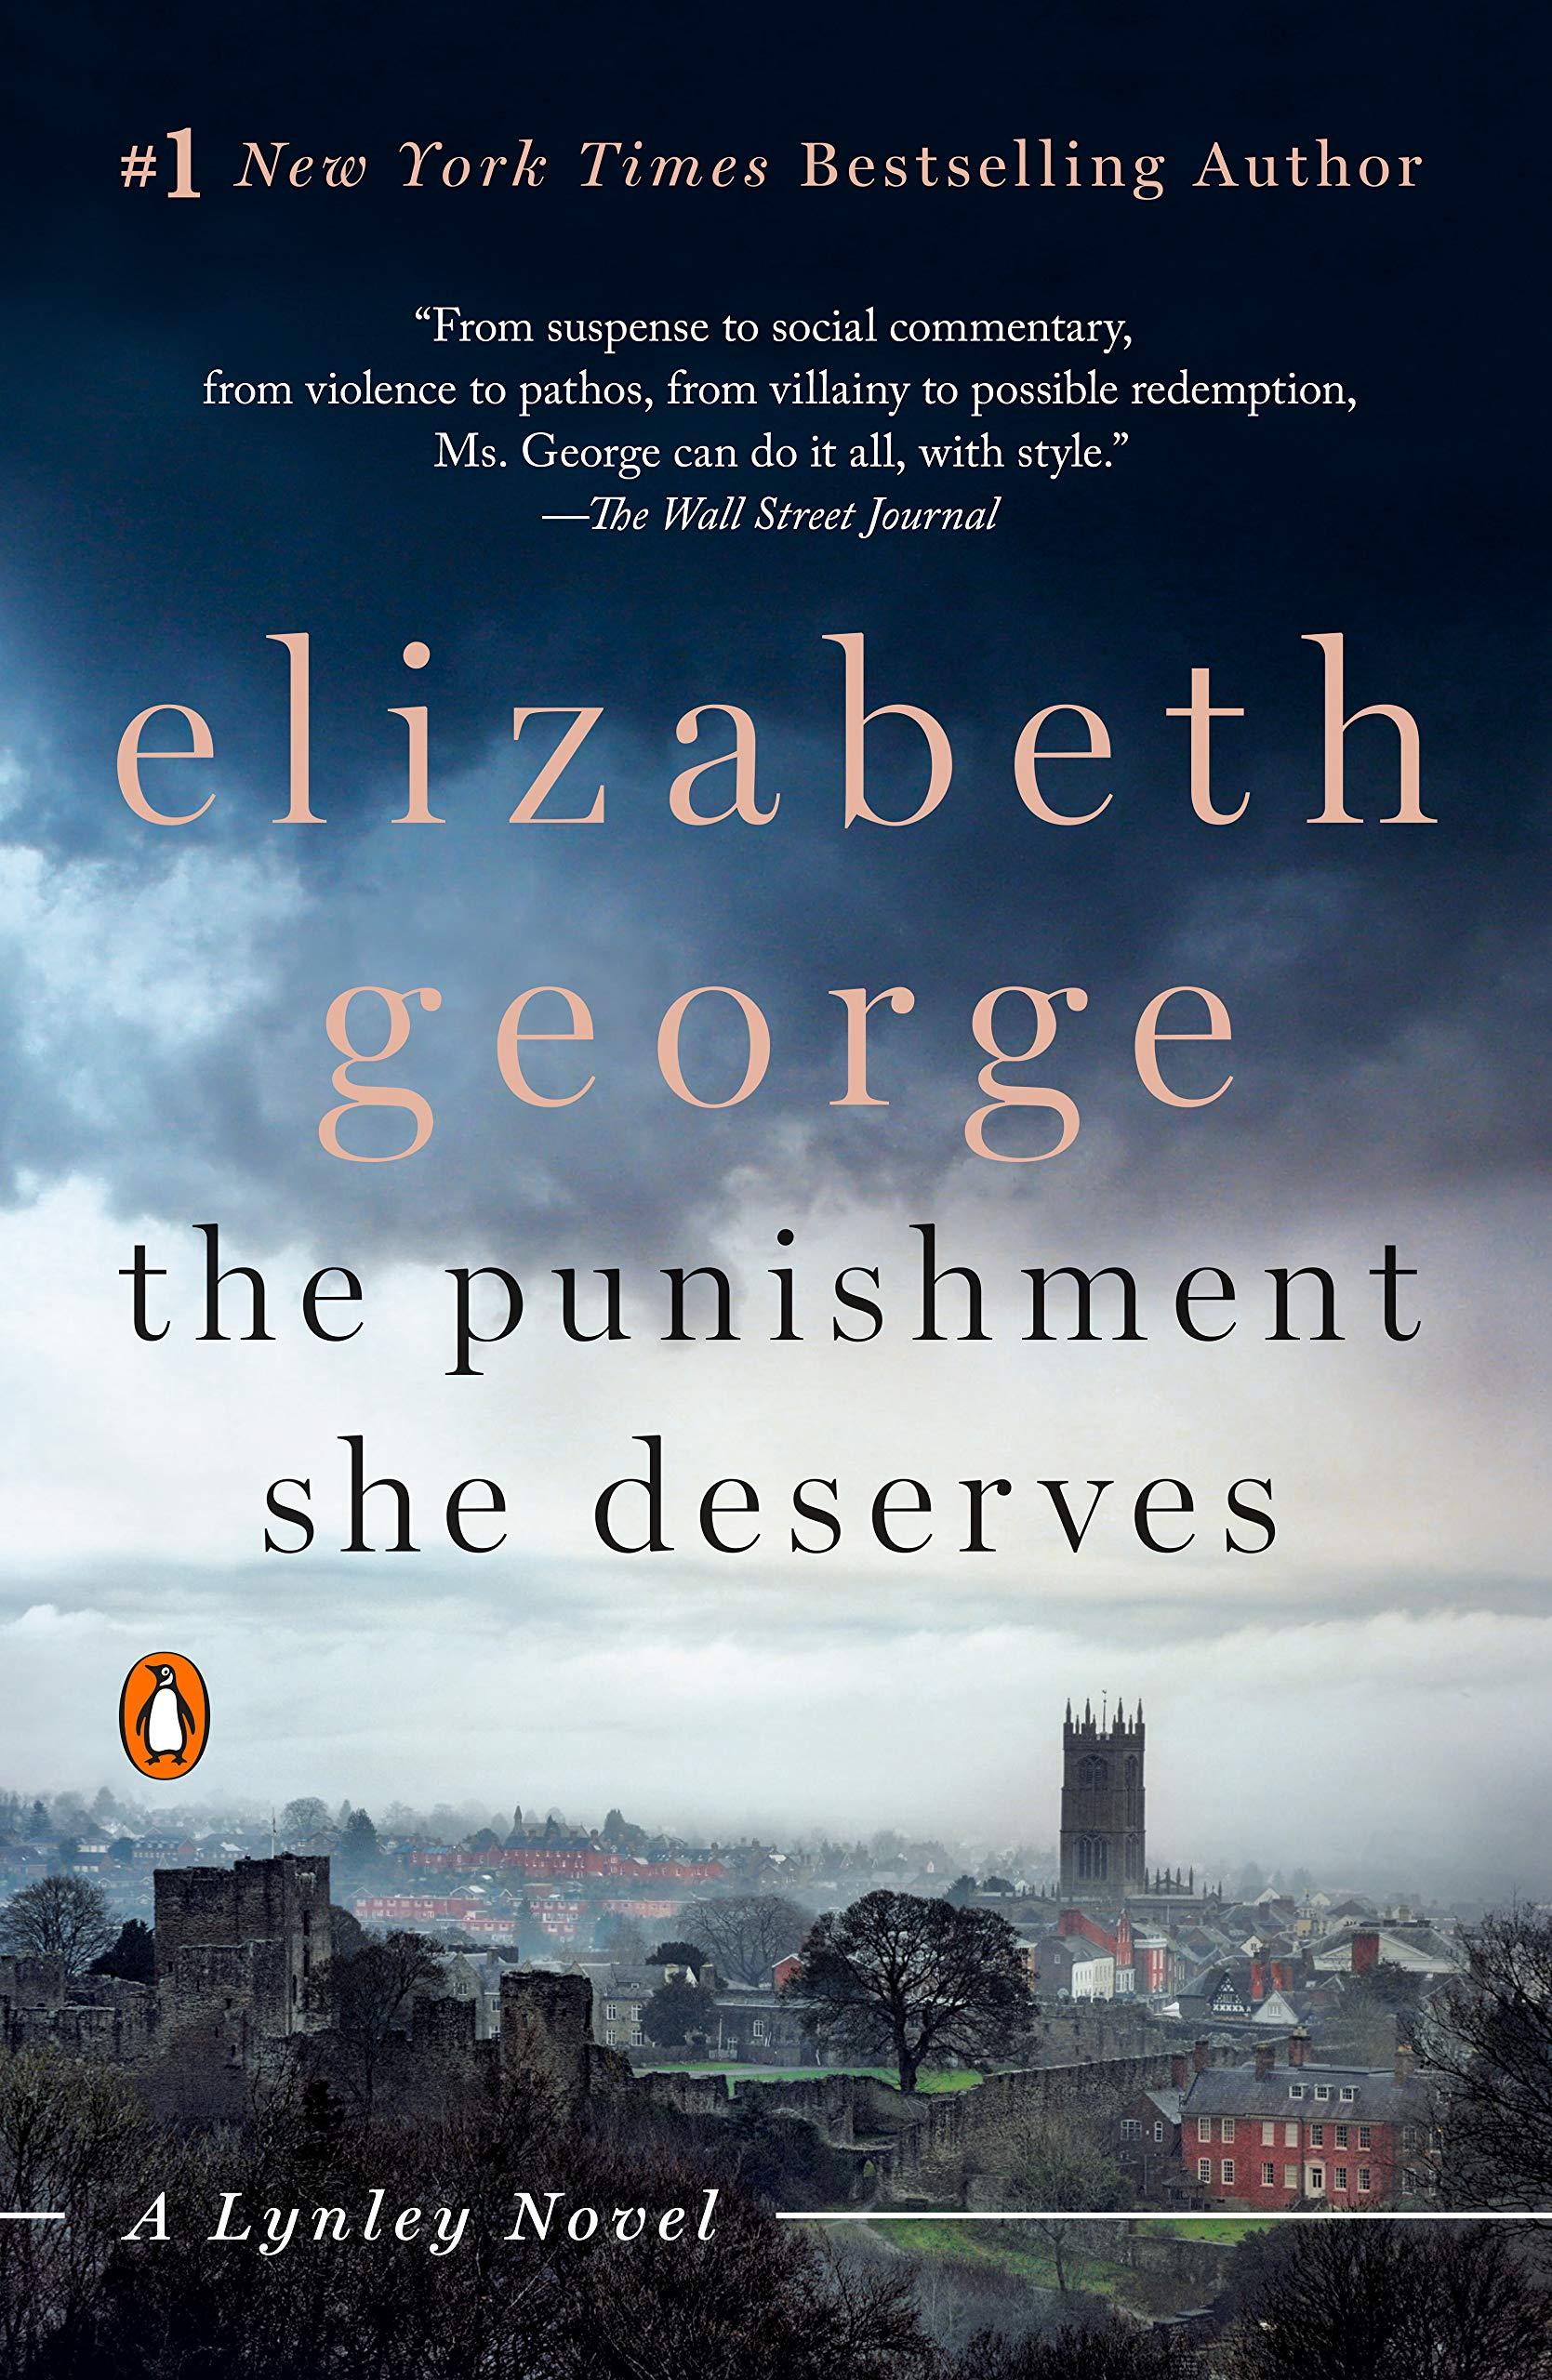 The Punishment She Deserves: A Lynley Novel (Inspector Lynley Book 20)